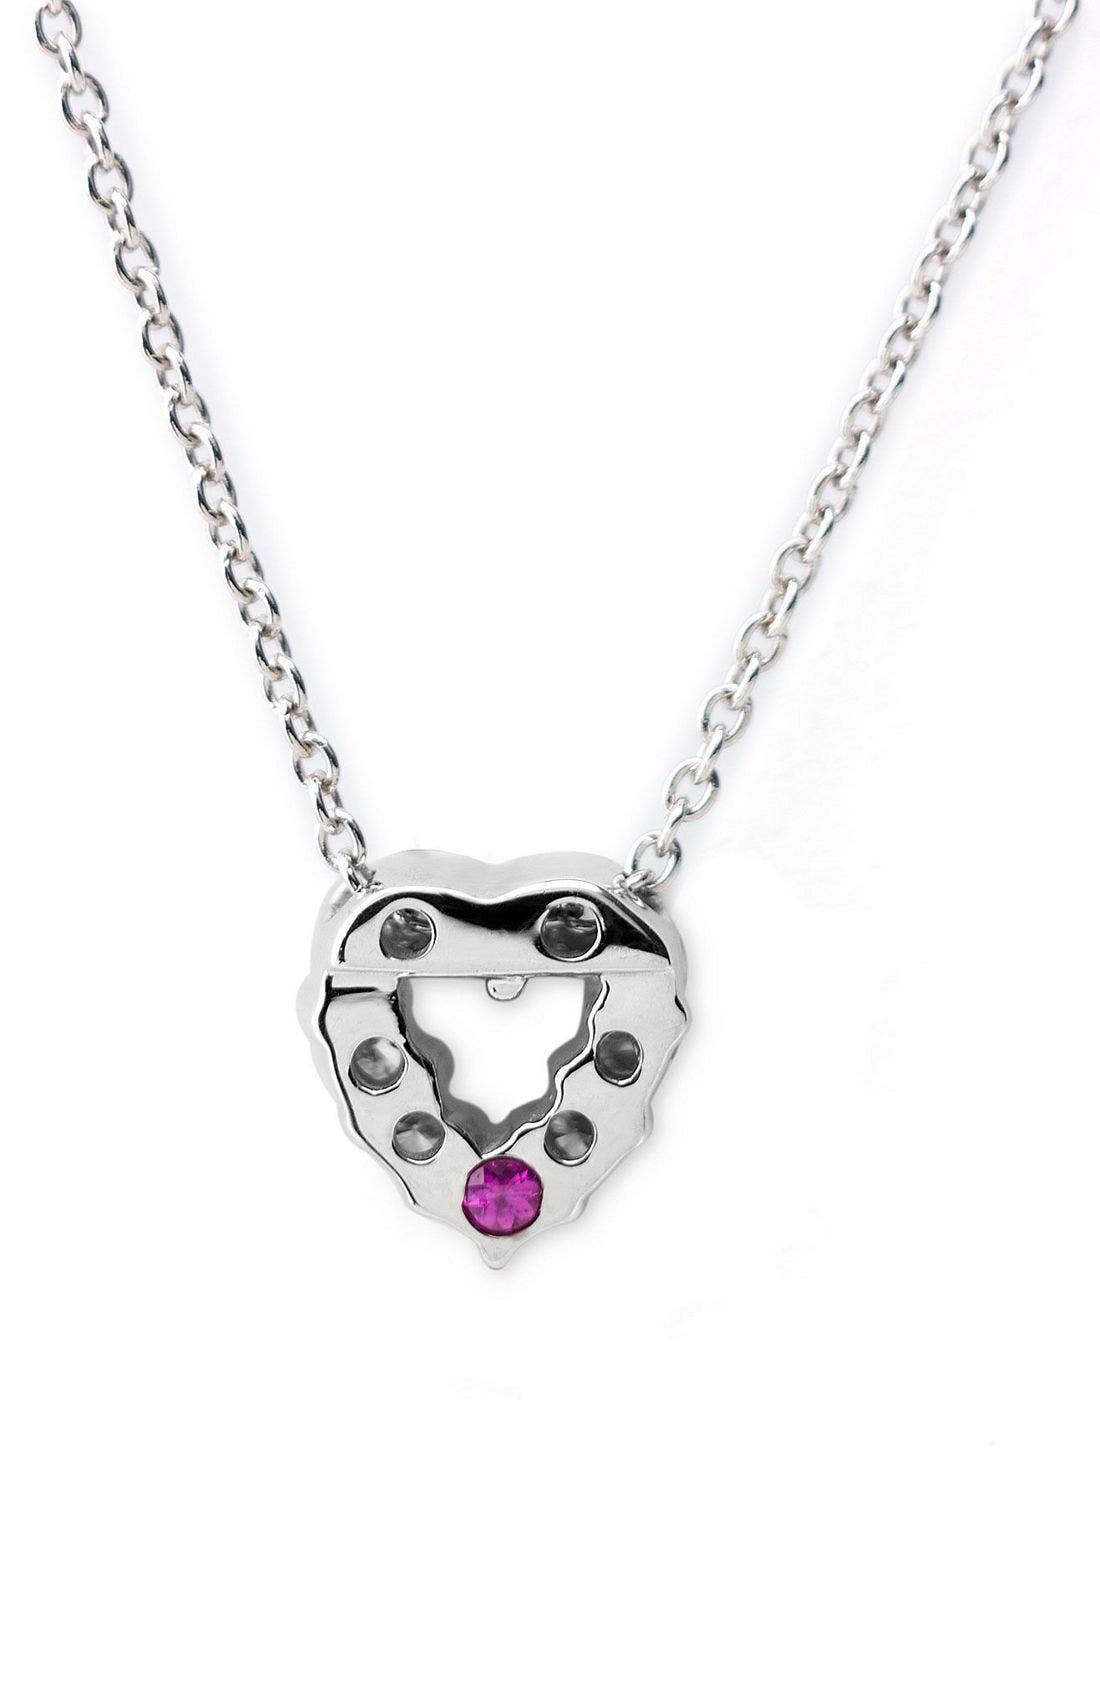 'Tiny Treasures' Diamond Heart Pendant Necklace,                             Alternate thumbnail 4, color,                             WHITE GOLD